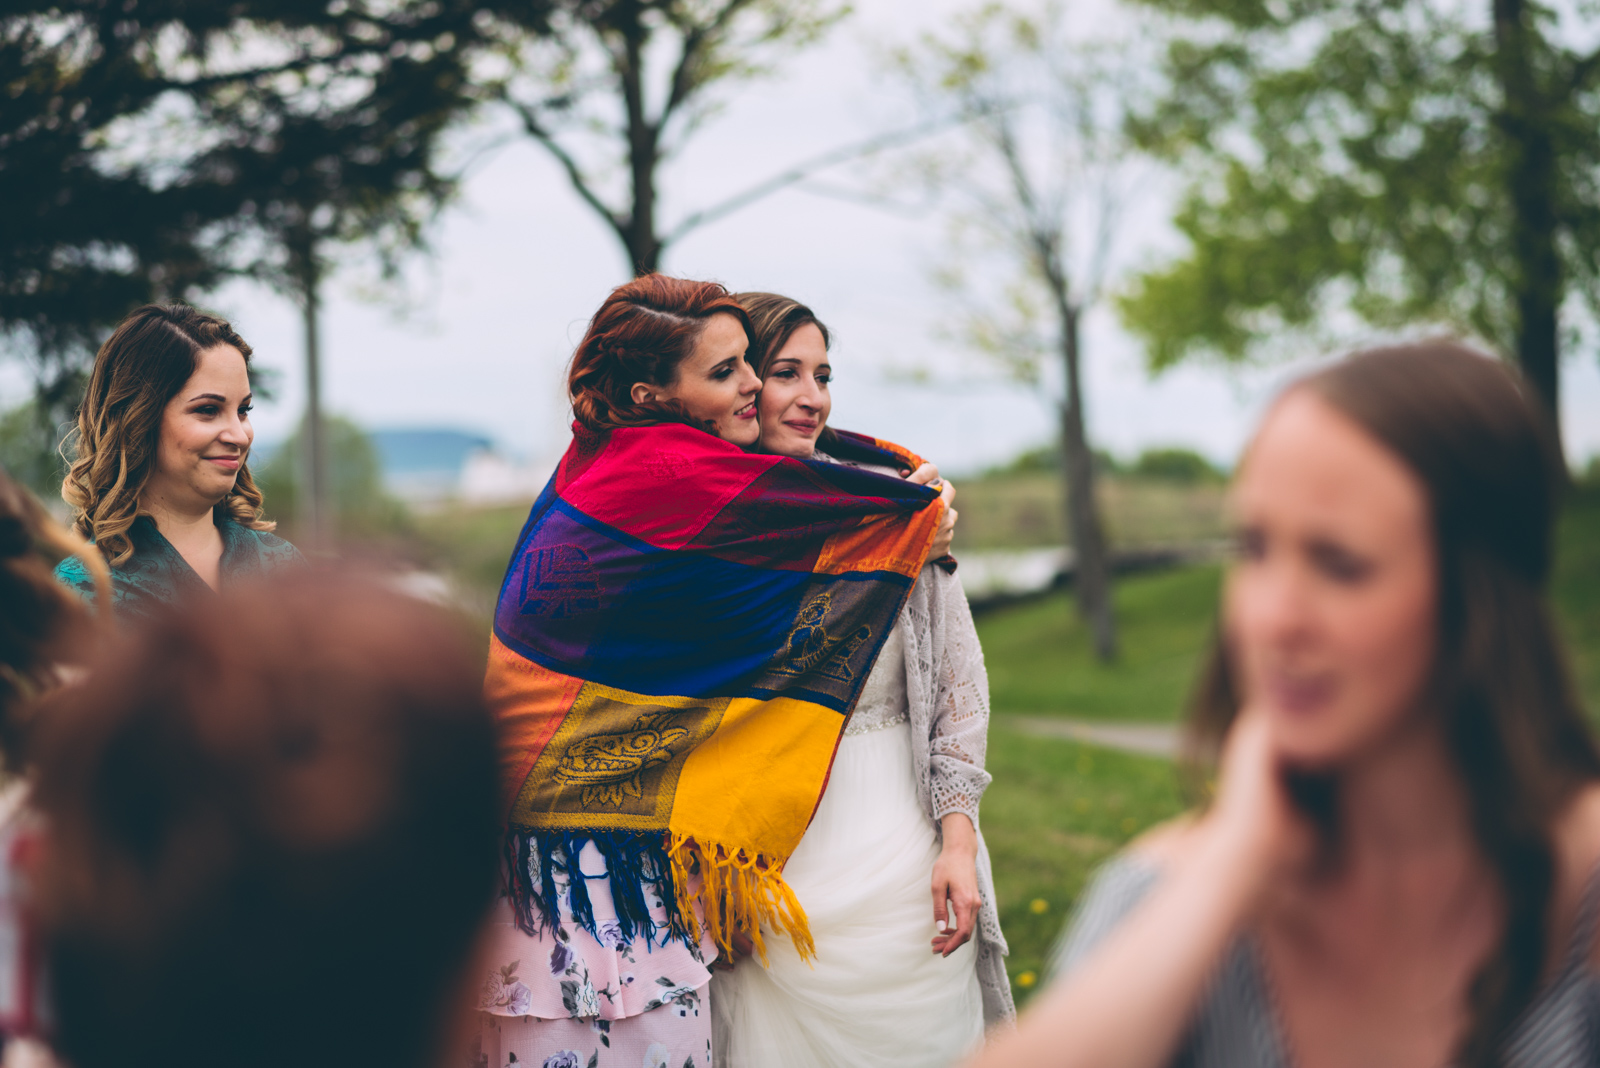 top-wedding-photos-2018-blog-17.jpg